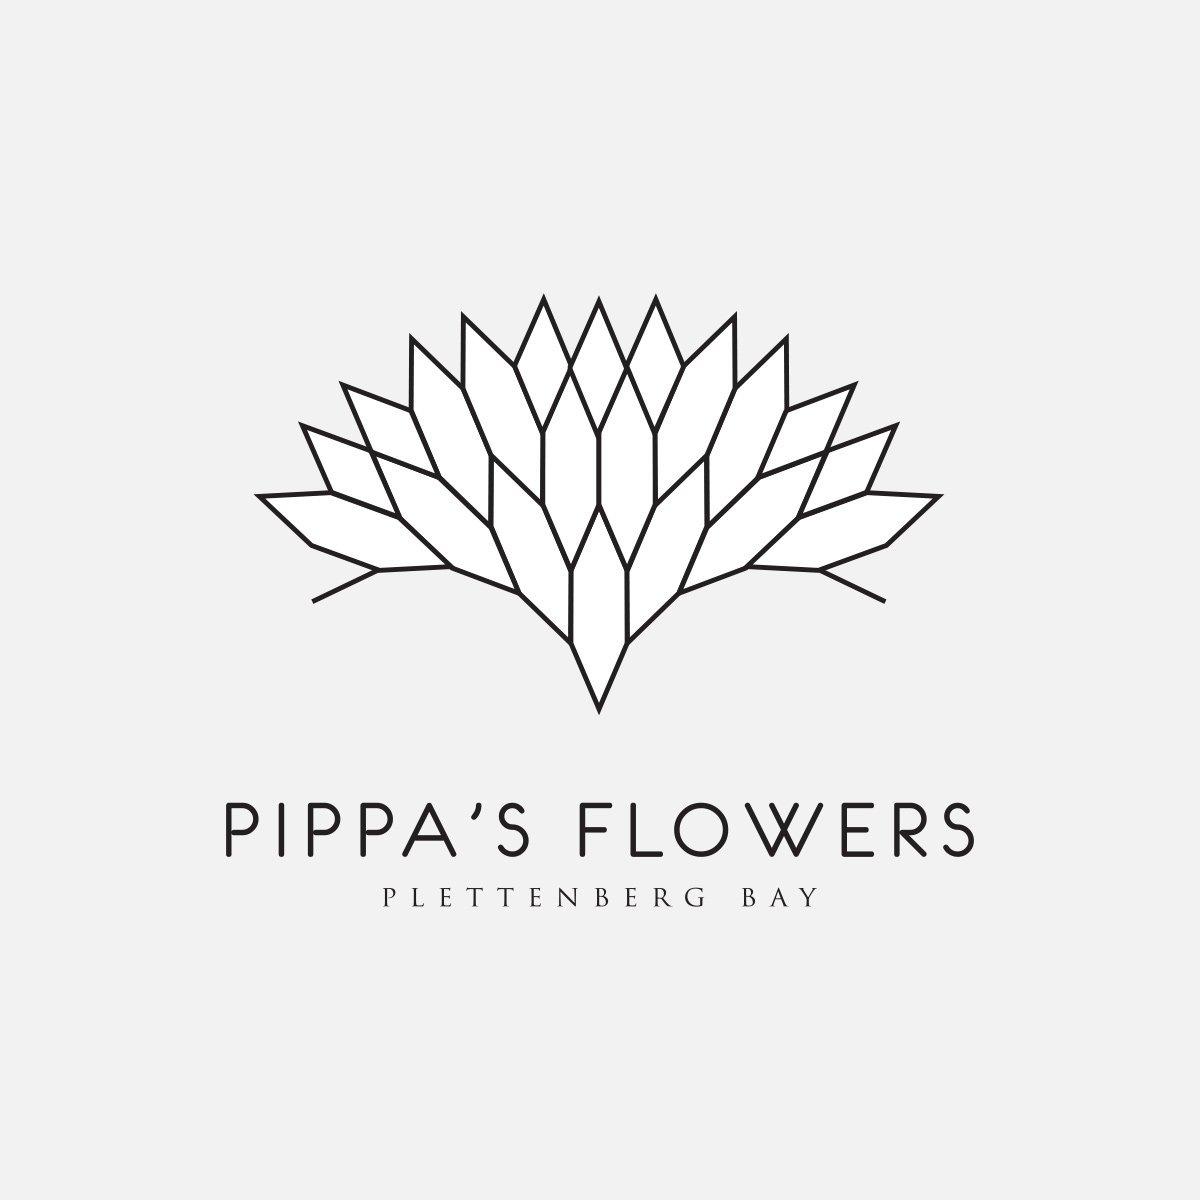 Pippas Flowers Logo